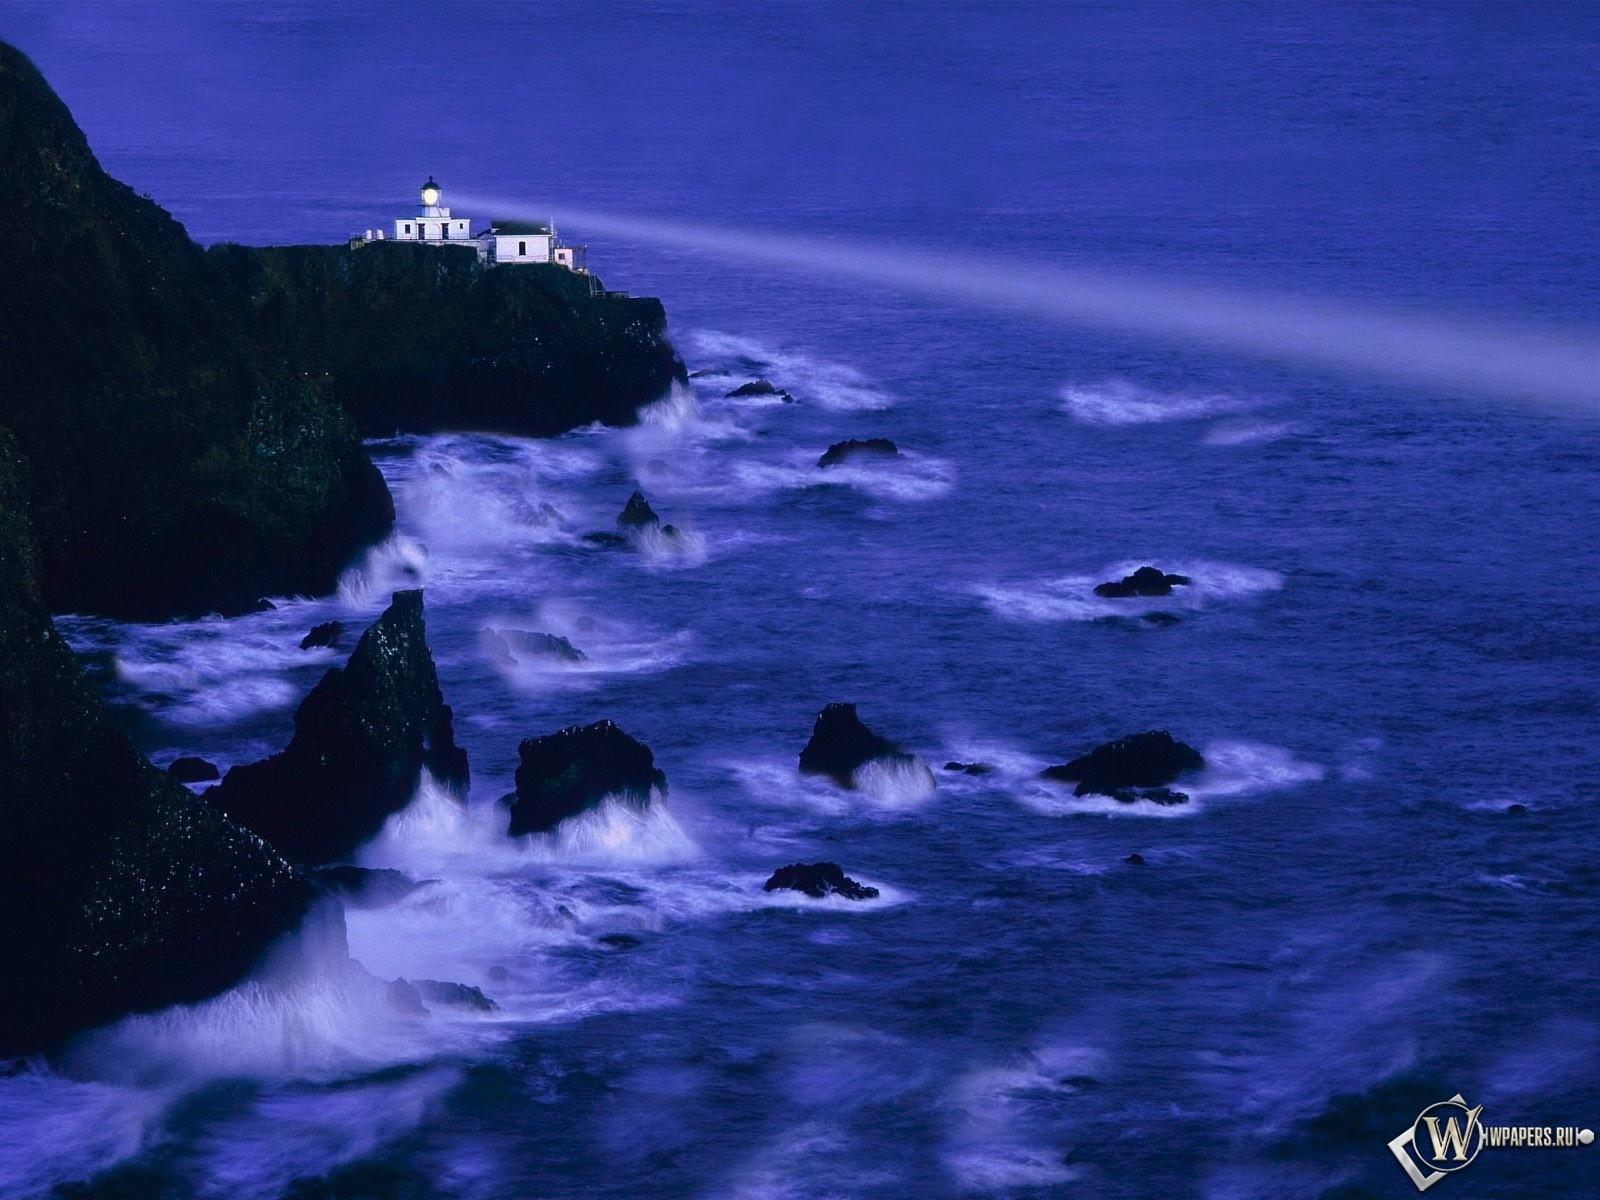 Ночной маяк 1600x1200